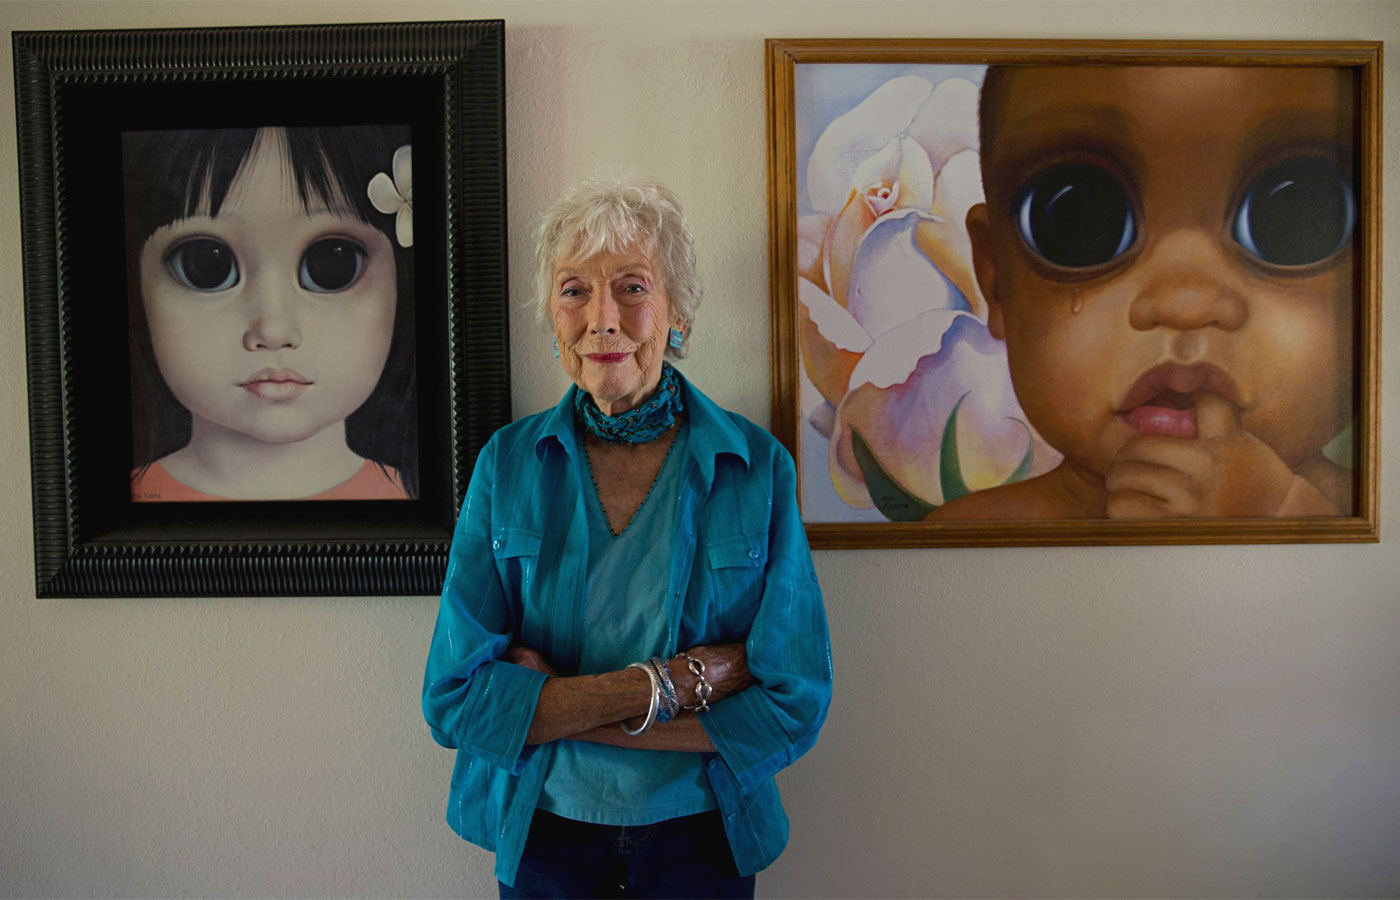 Fabuleux Big Eyes: i grandi occhi di Margaret Keane - La Scatola delle Idee IA71